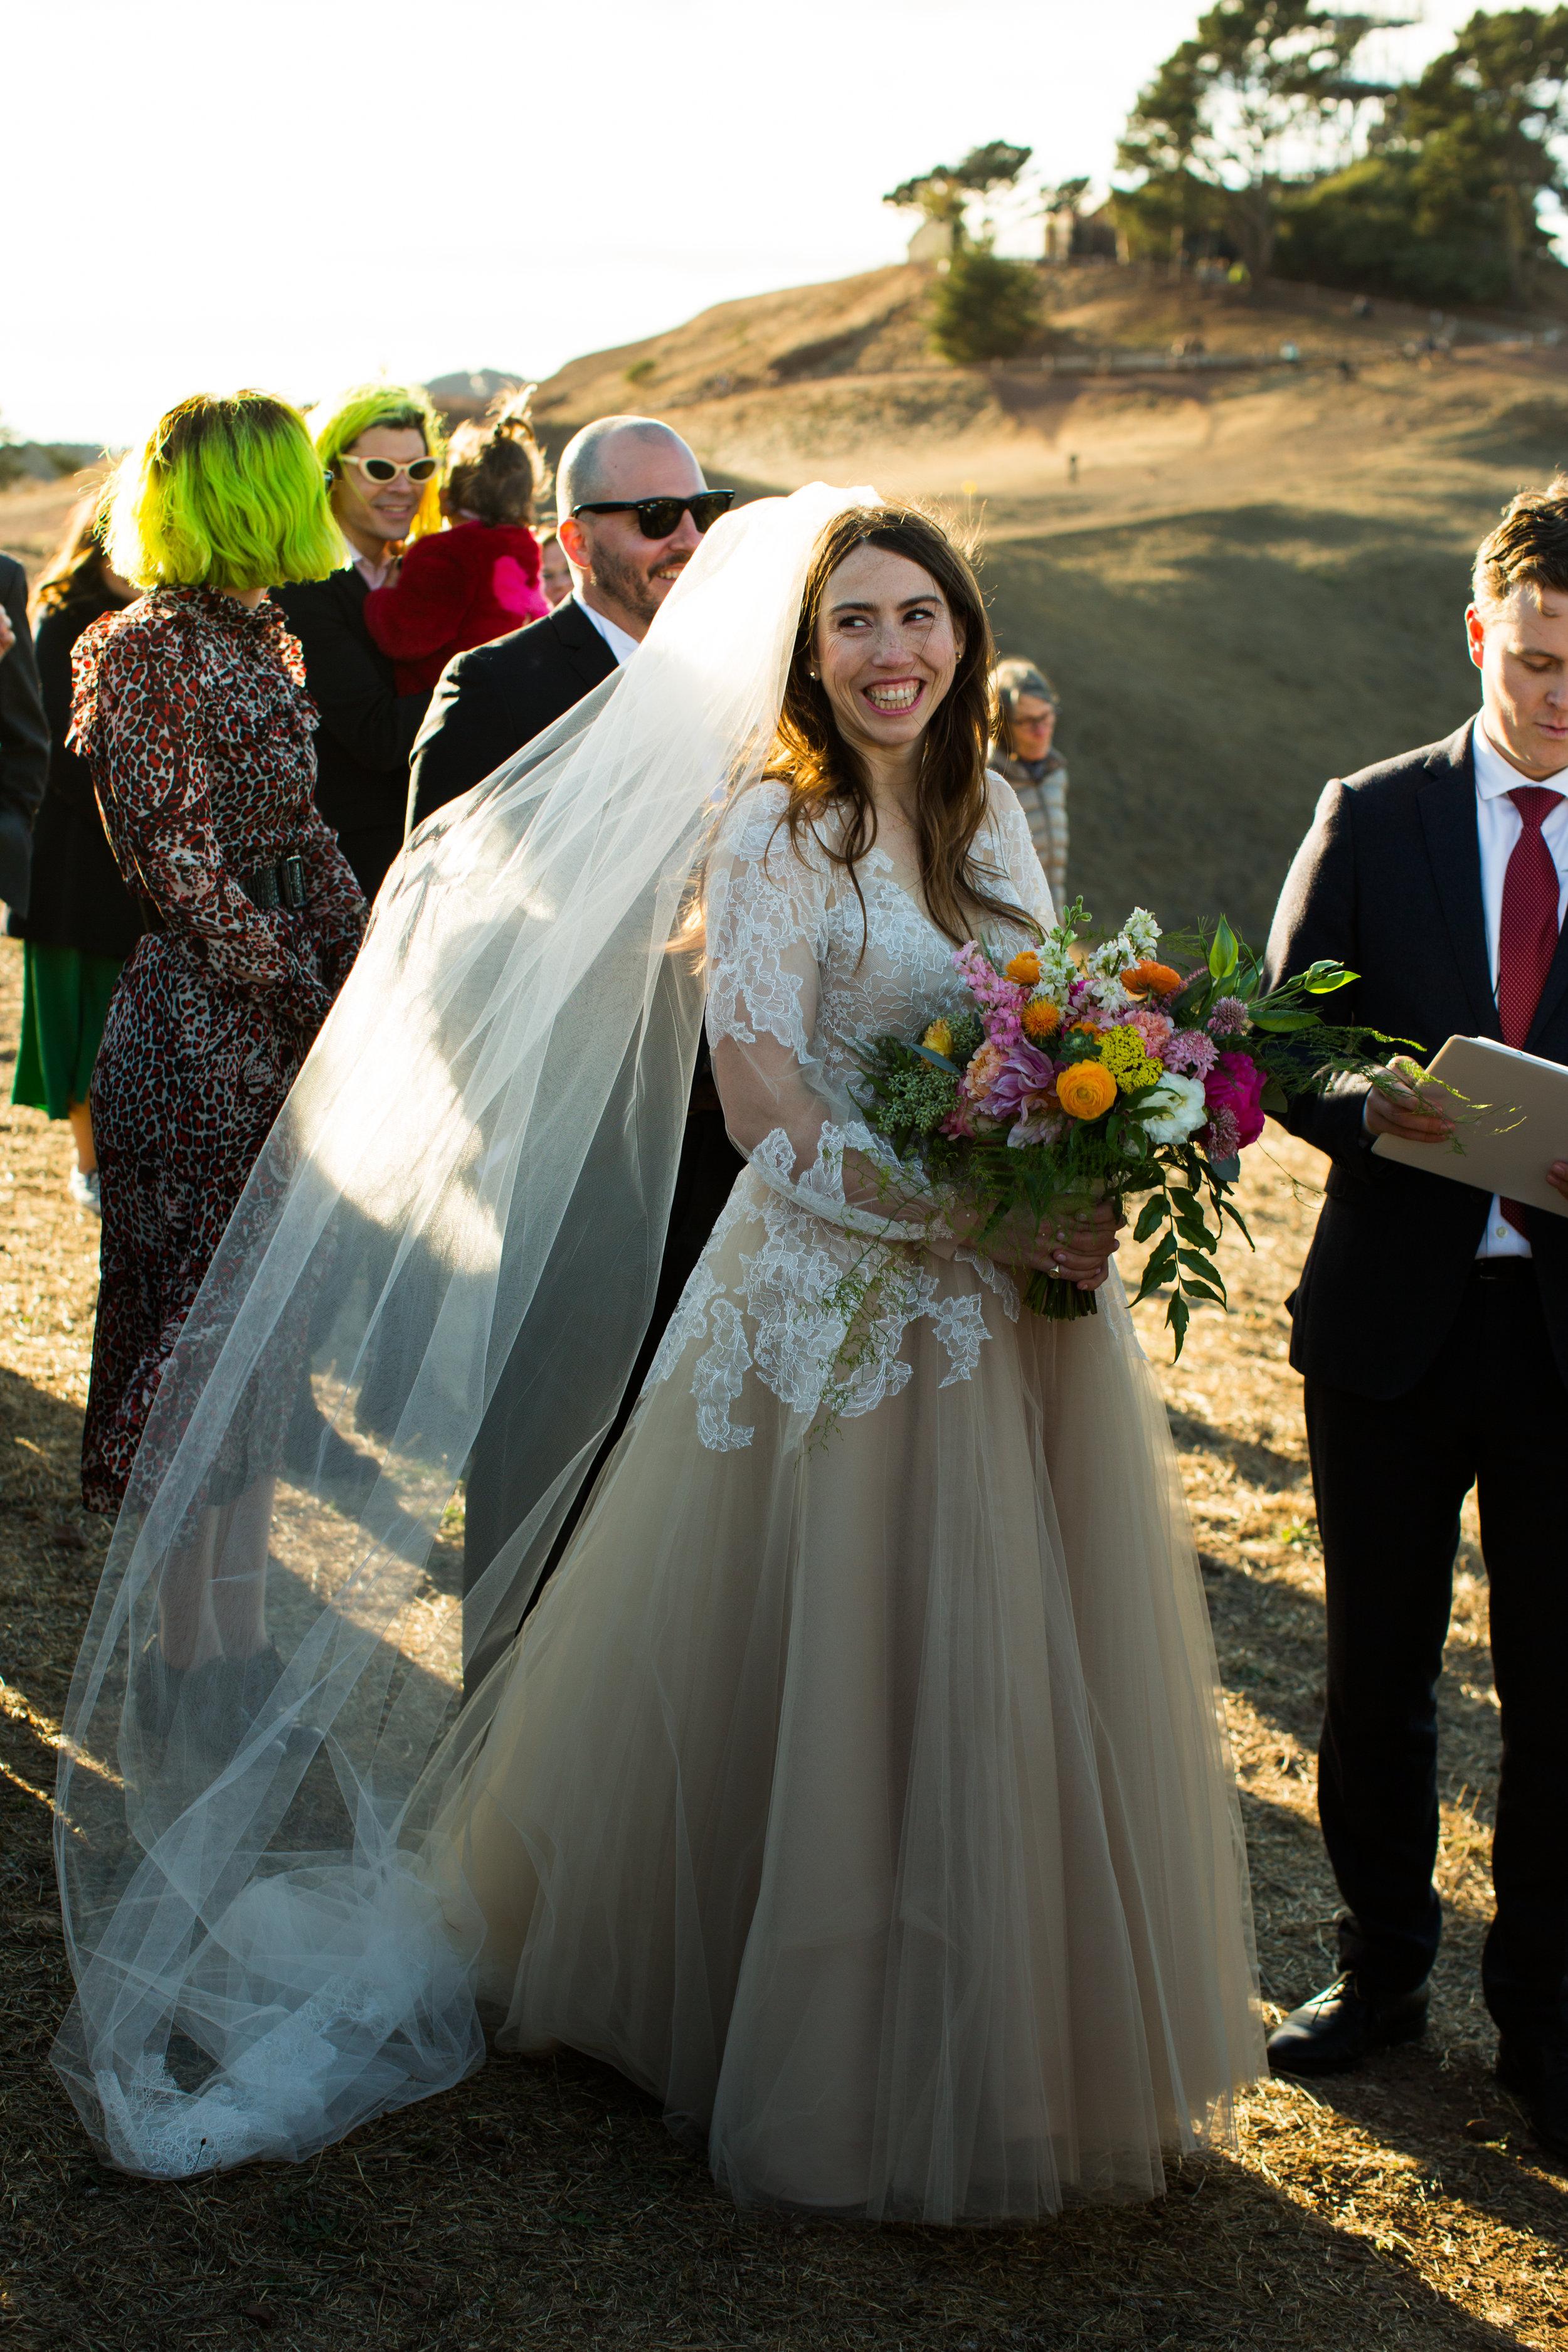 Bernal Heights Park Wedding Ceremony-100.jpg